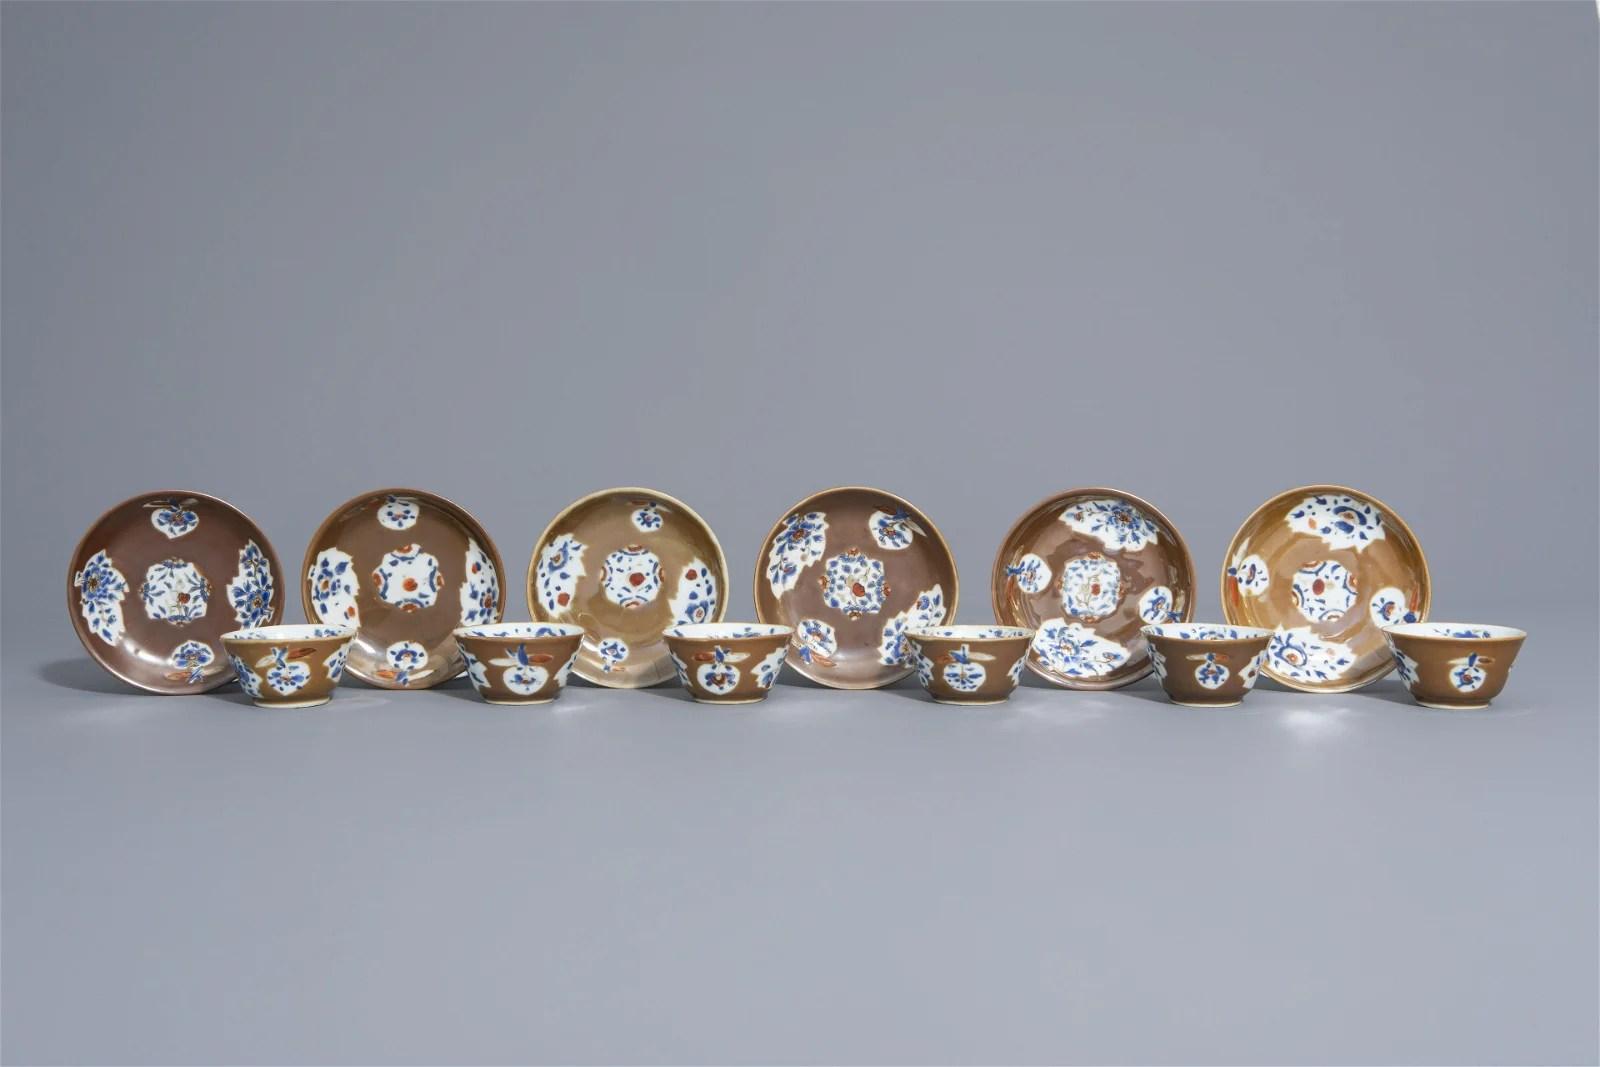 Six Chinese Imari style Batavian ware cups and saucers,